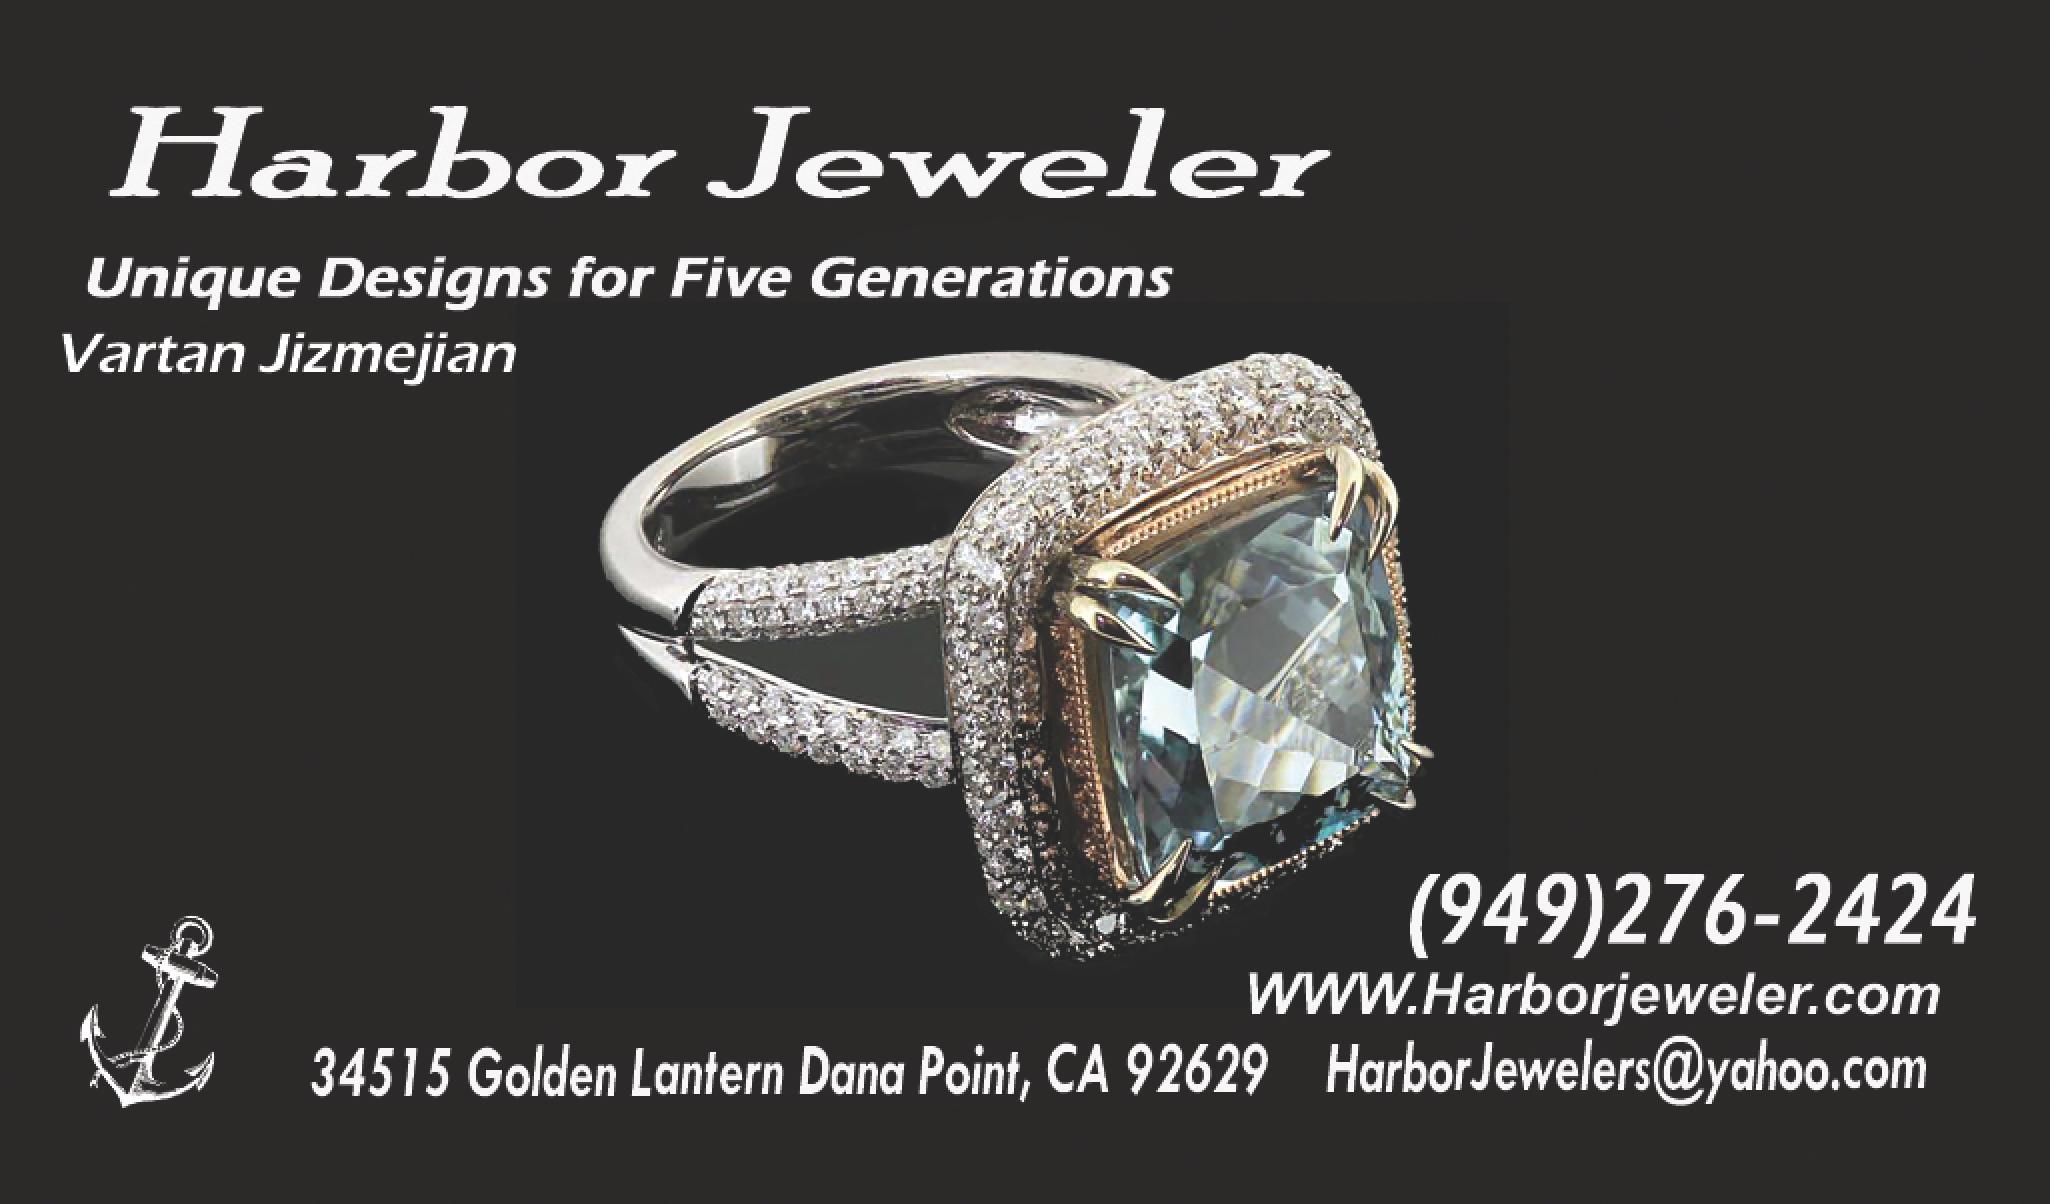 Harbor Jeweler